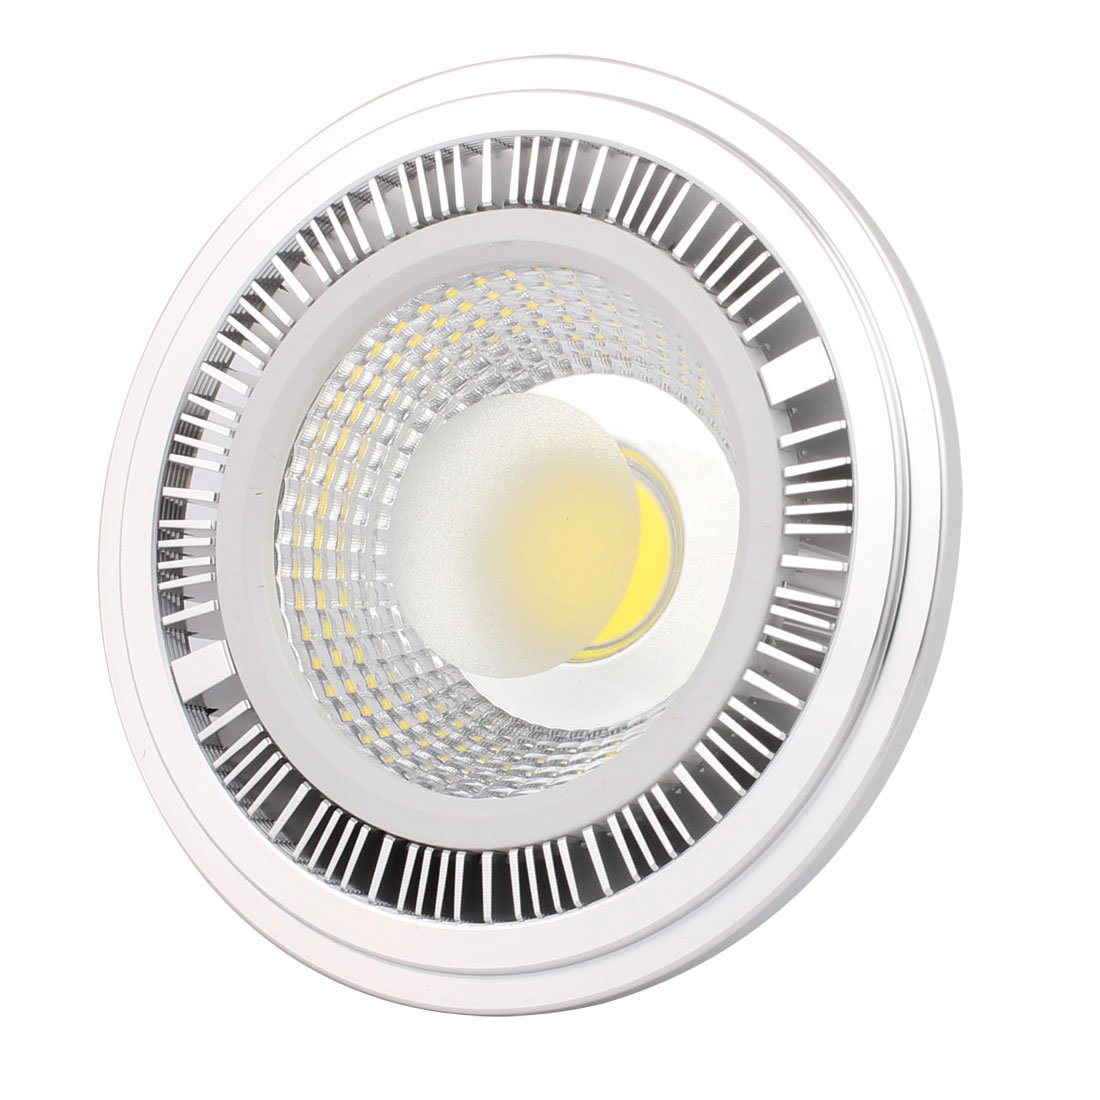 Aexit ac 12v lighting fixtures and controls 5w 6000k gu10 recessed cob led bulb long head ceiling lamp ar111 amazon com